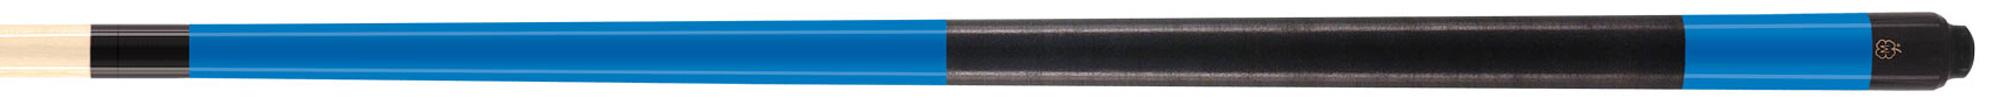 21510 mcdermott k93c piljardikii